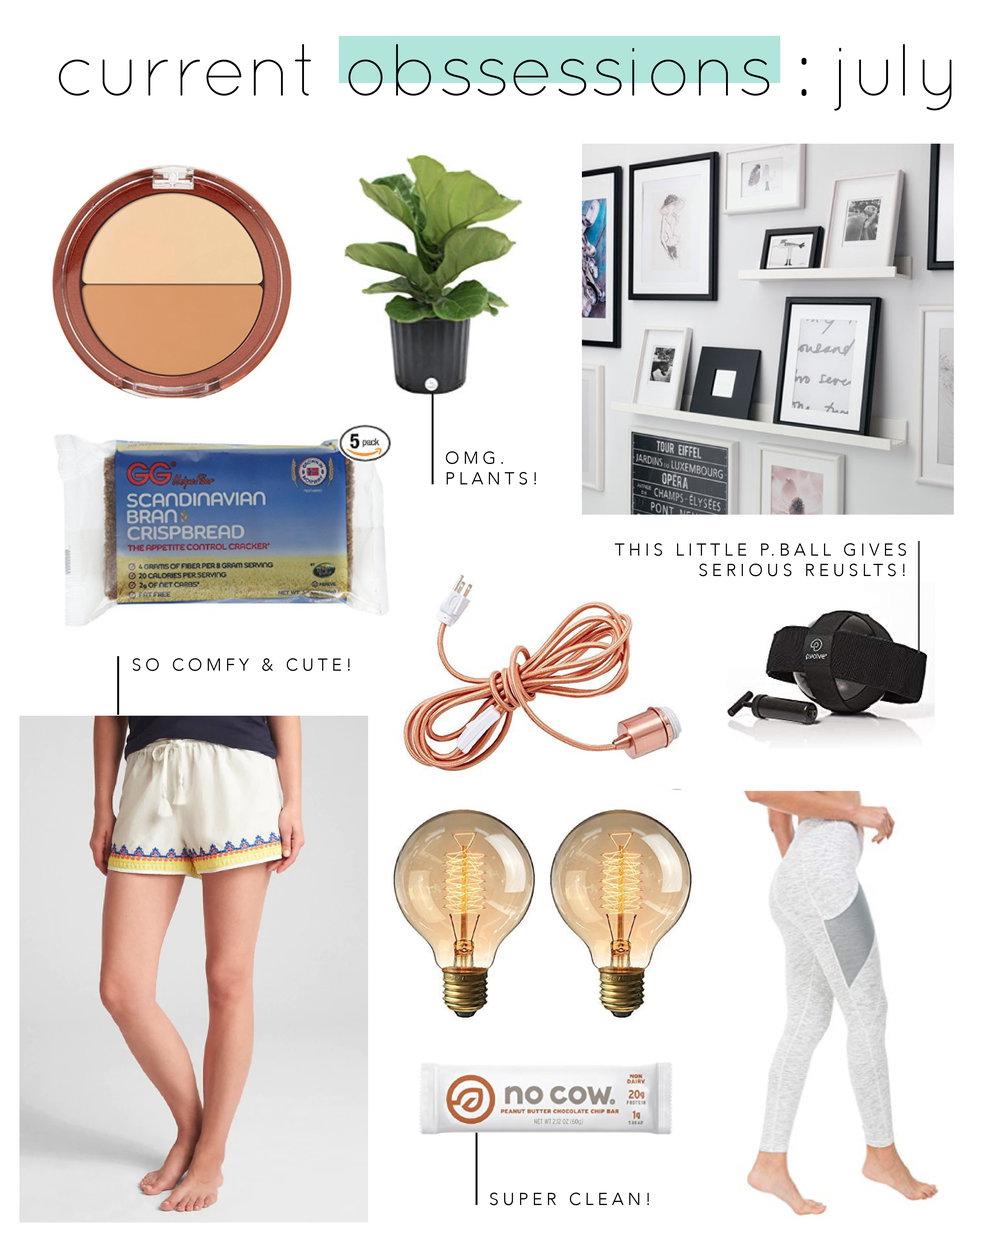 Concealer  |  Plant  |  Shelves  |  Lounge Shorts  |  Light fixture  |  Bulbs  |  No Cow Bar  |  P.Ball  |  Leggings